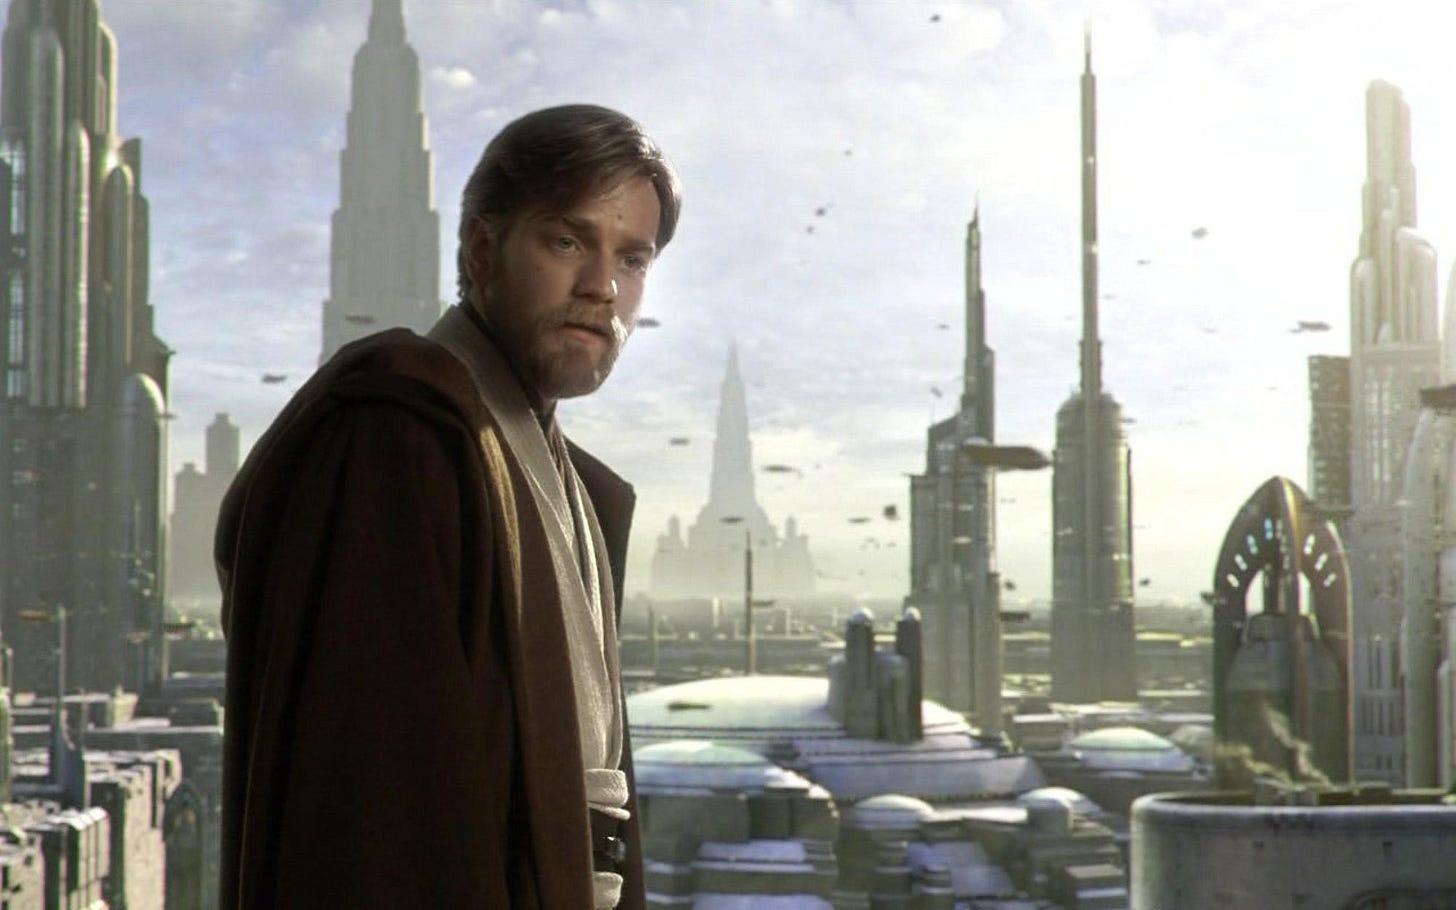 Obi Wan in Revenge of the Sith.